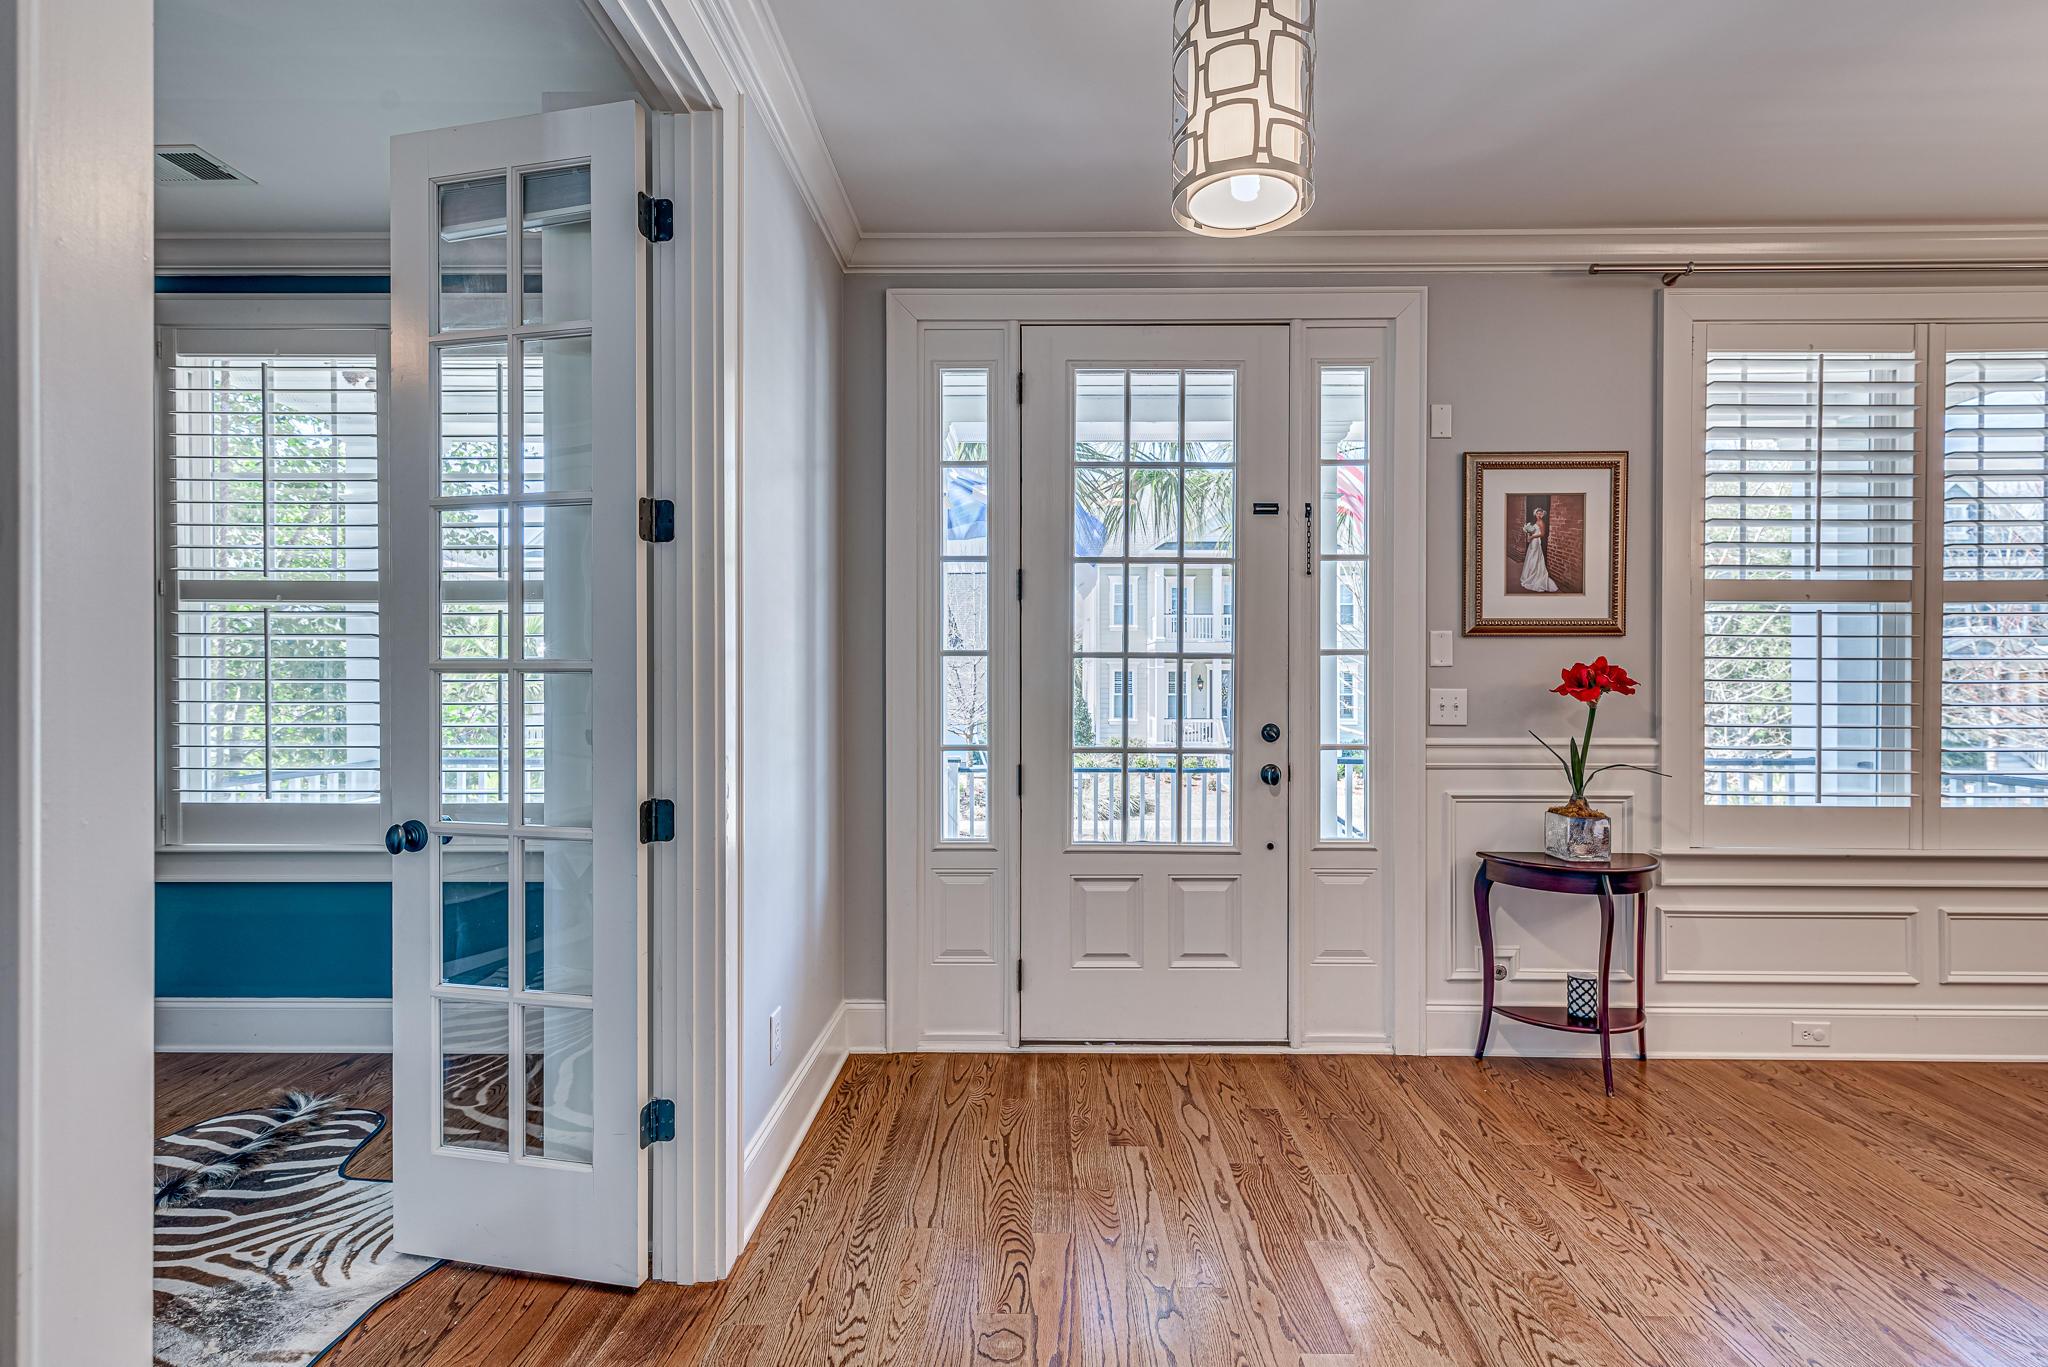 Daniel Island Smythe Park Homes For Sale - 1410 Wando View, Charleston, SC - 12